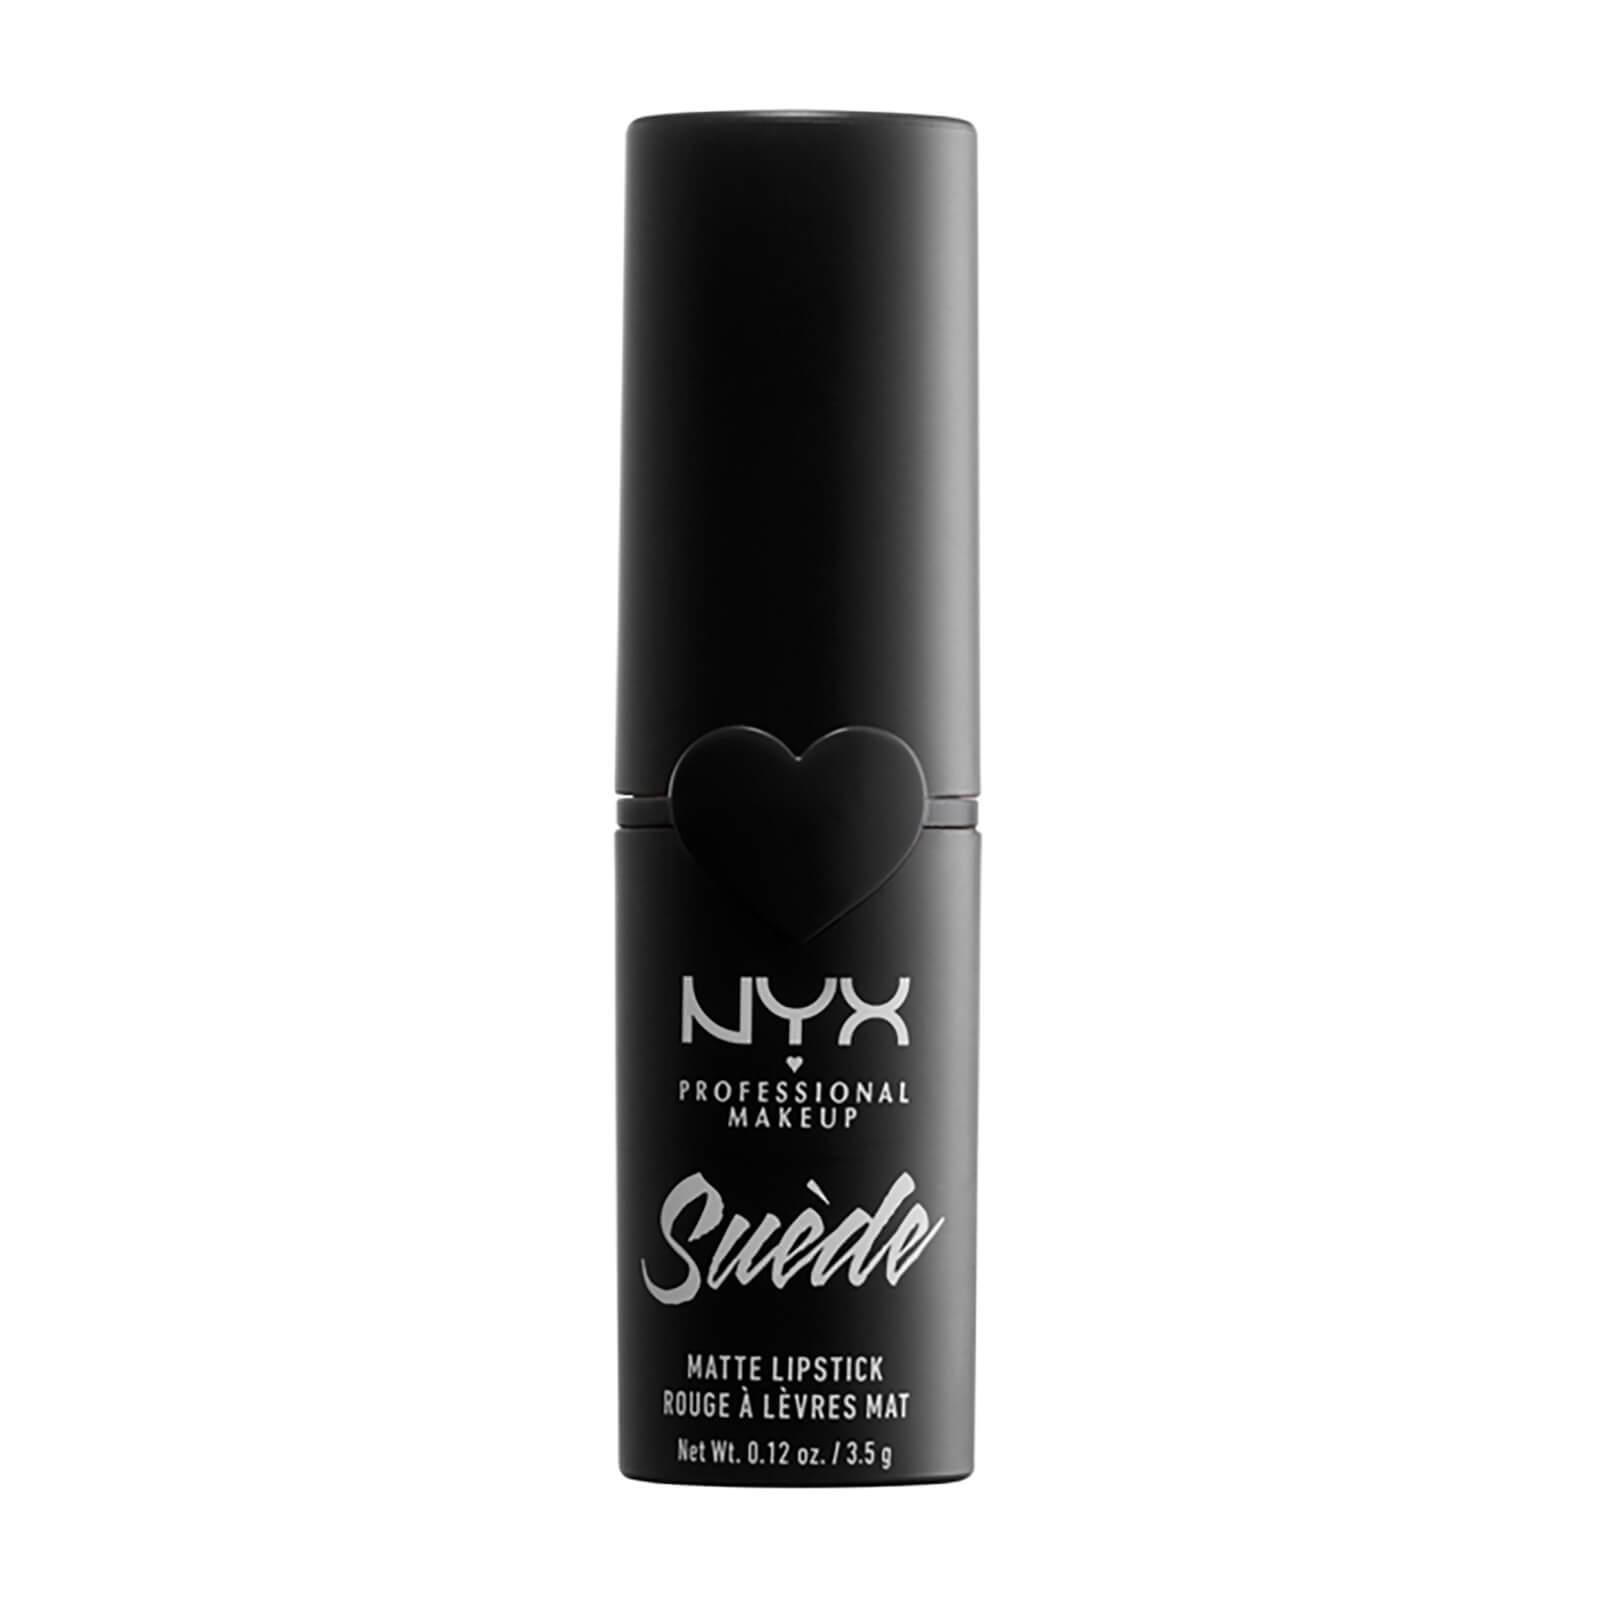 nyx professional makeup suede matte lipstick (various shades) - alien